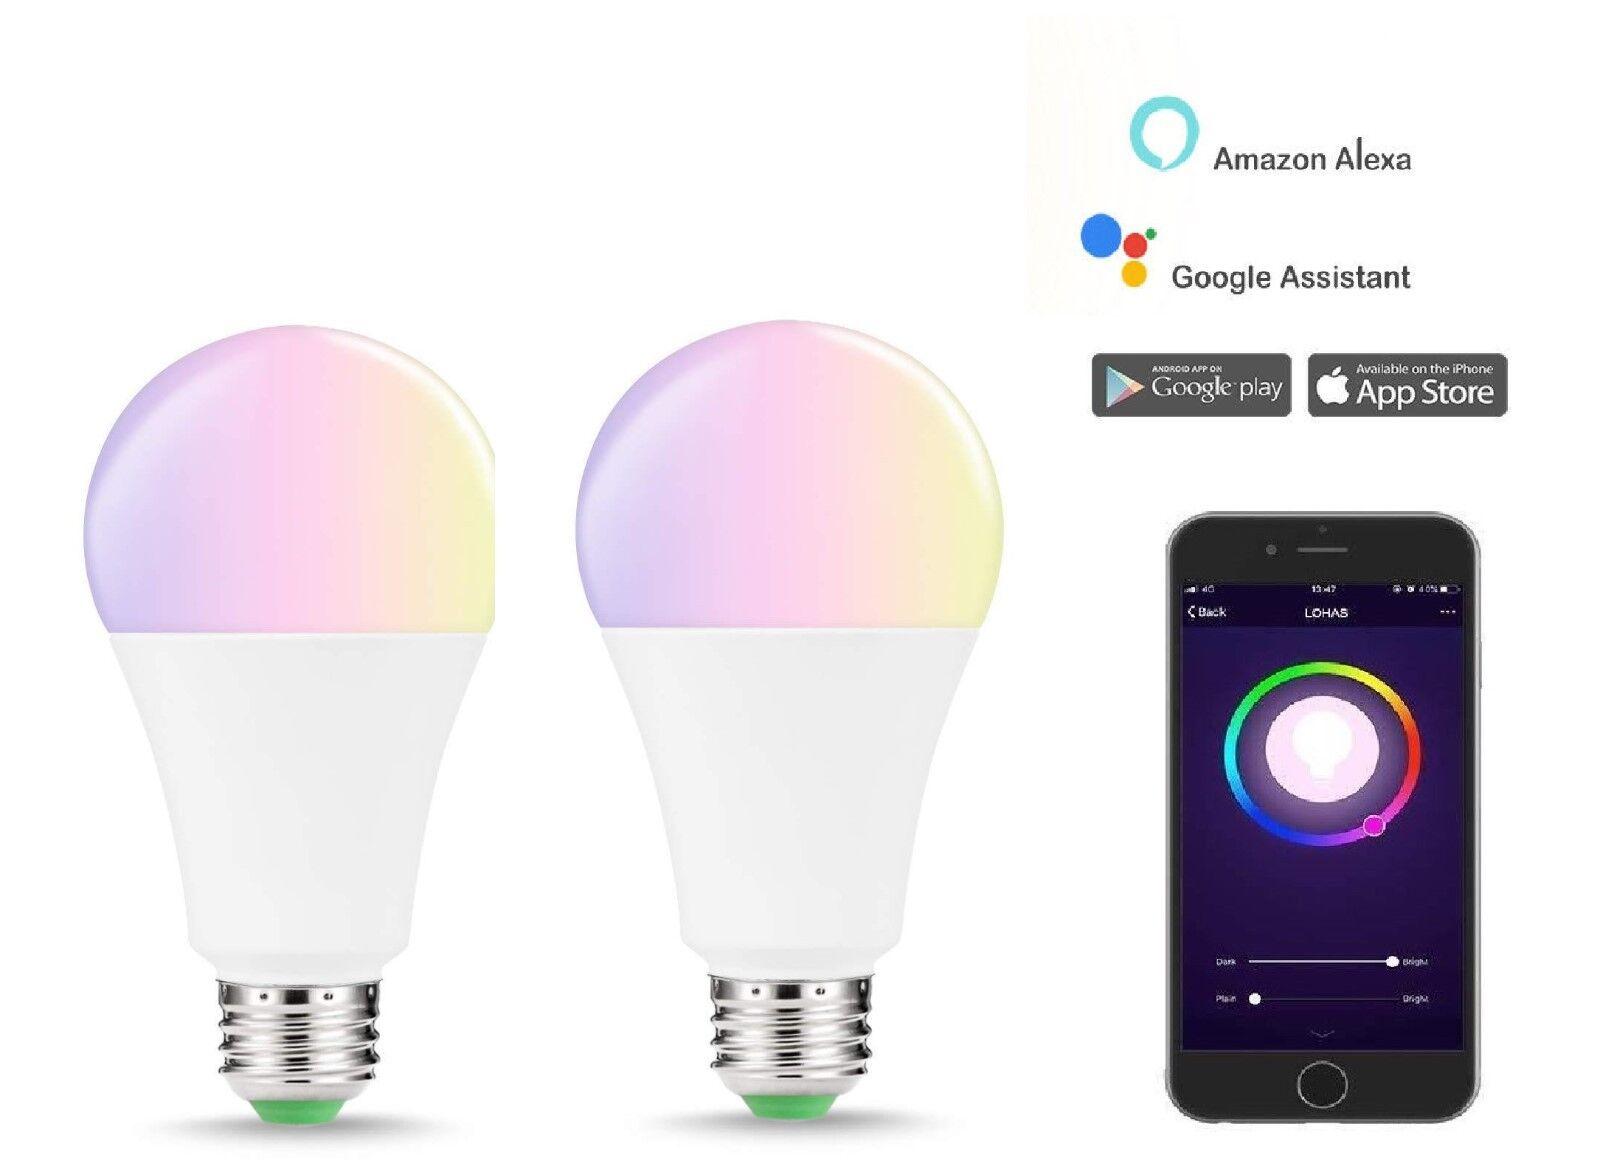 E27 Dimmable Wifi Smart Life RGB LED Light Bulbs For Alexa /& Google Assistant yh